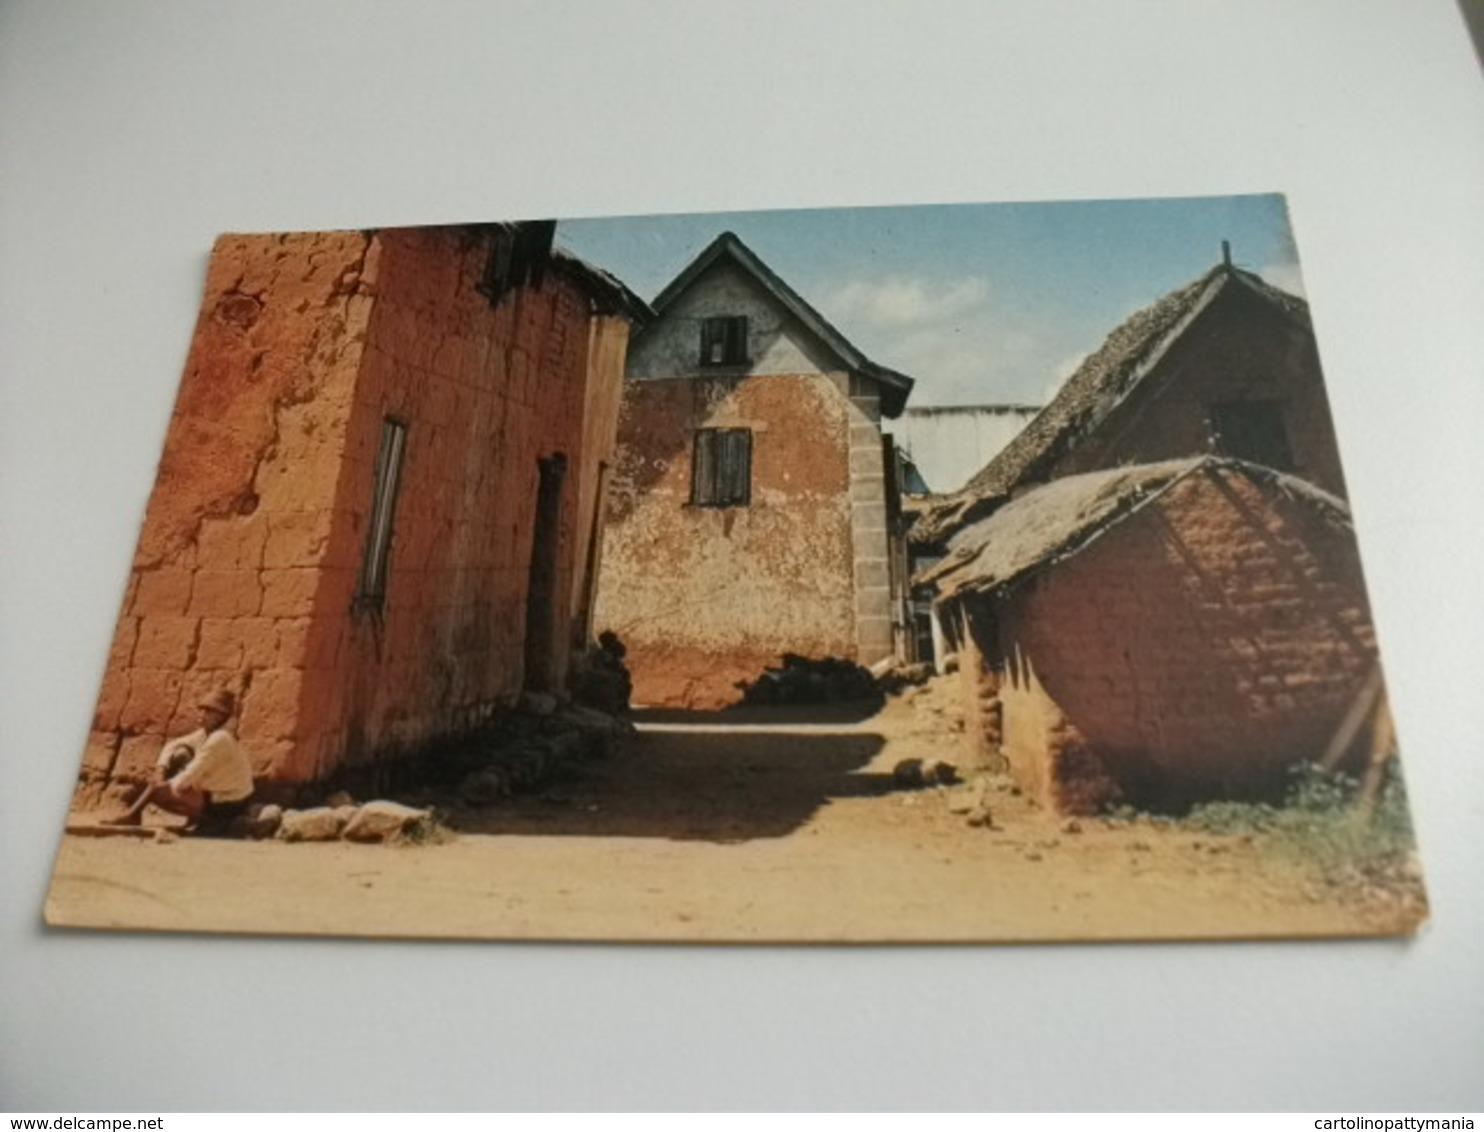 STORIA POSTALE FRANCOBOLLO COMMEMORATIVO MALAGASY MADASCAR LES ENVIRONS DE TANANARIVE - Madagascar